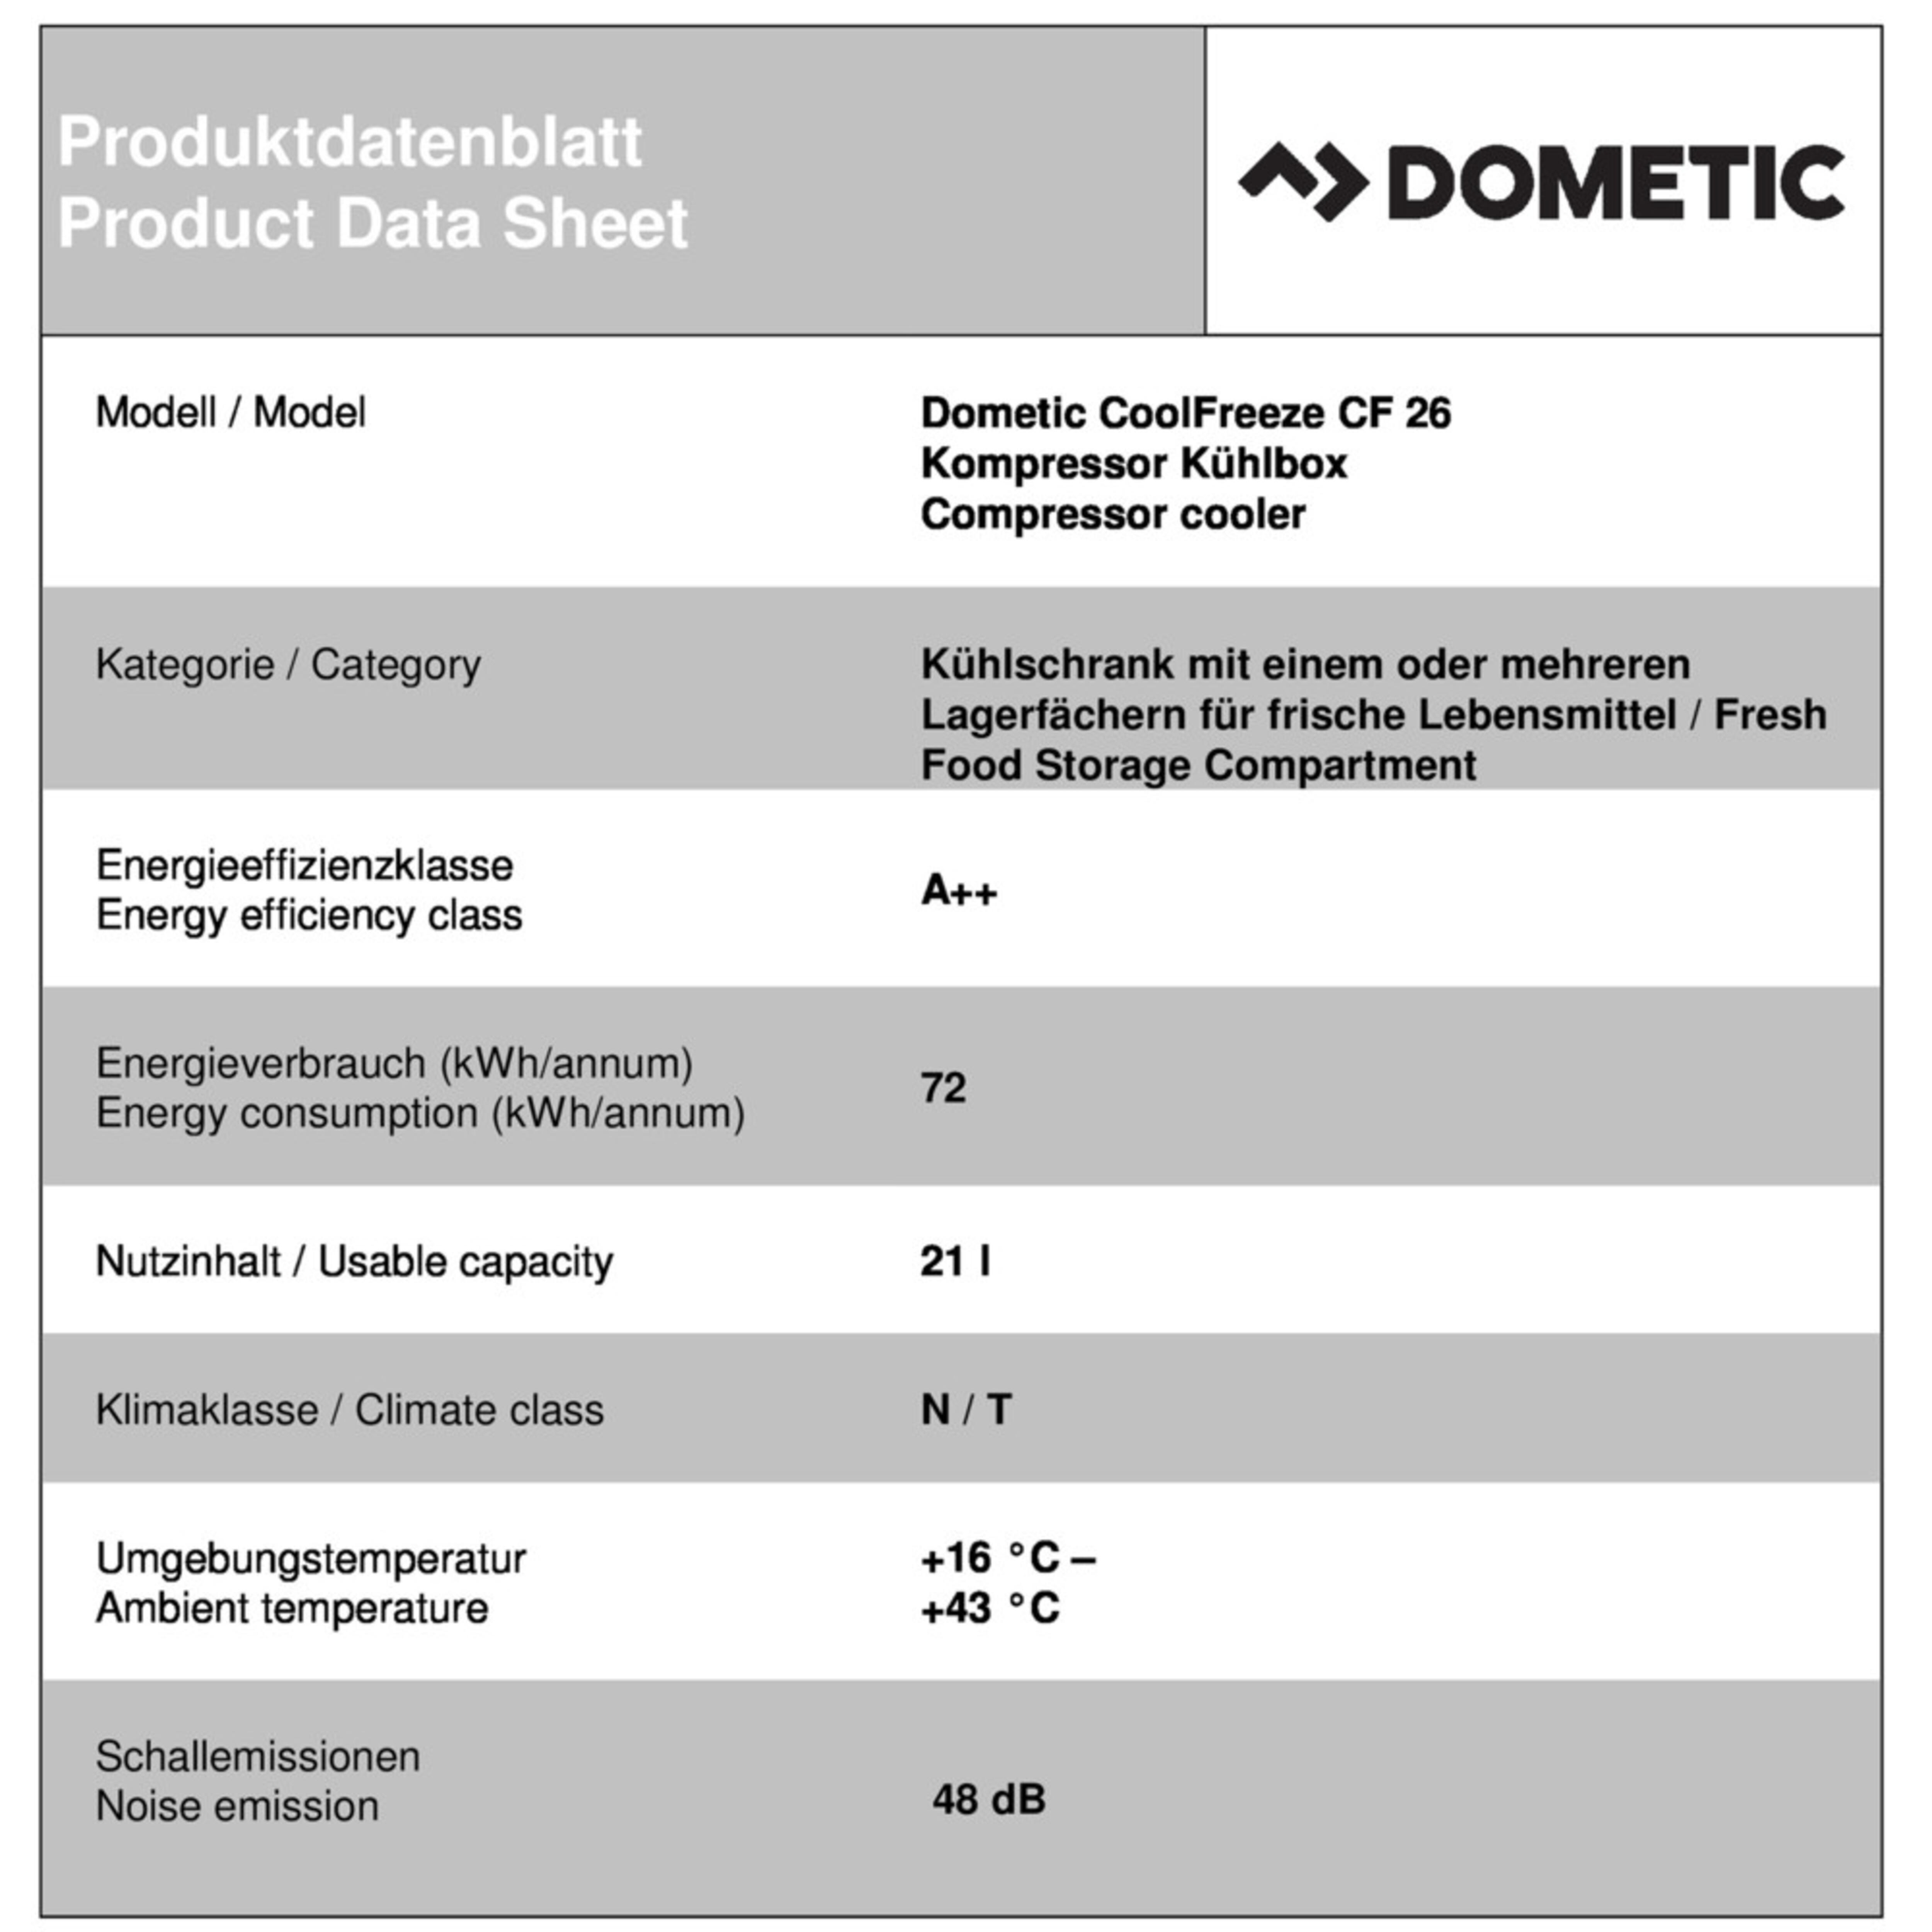 Dometic CoolFreeze CF 26 Productkaart